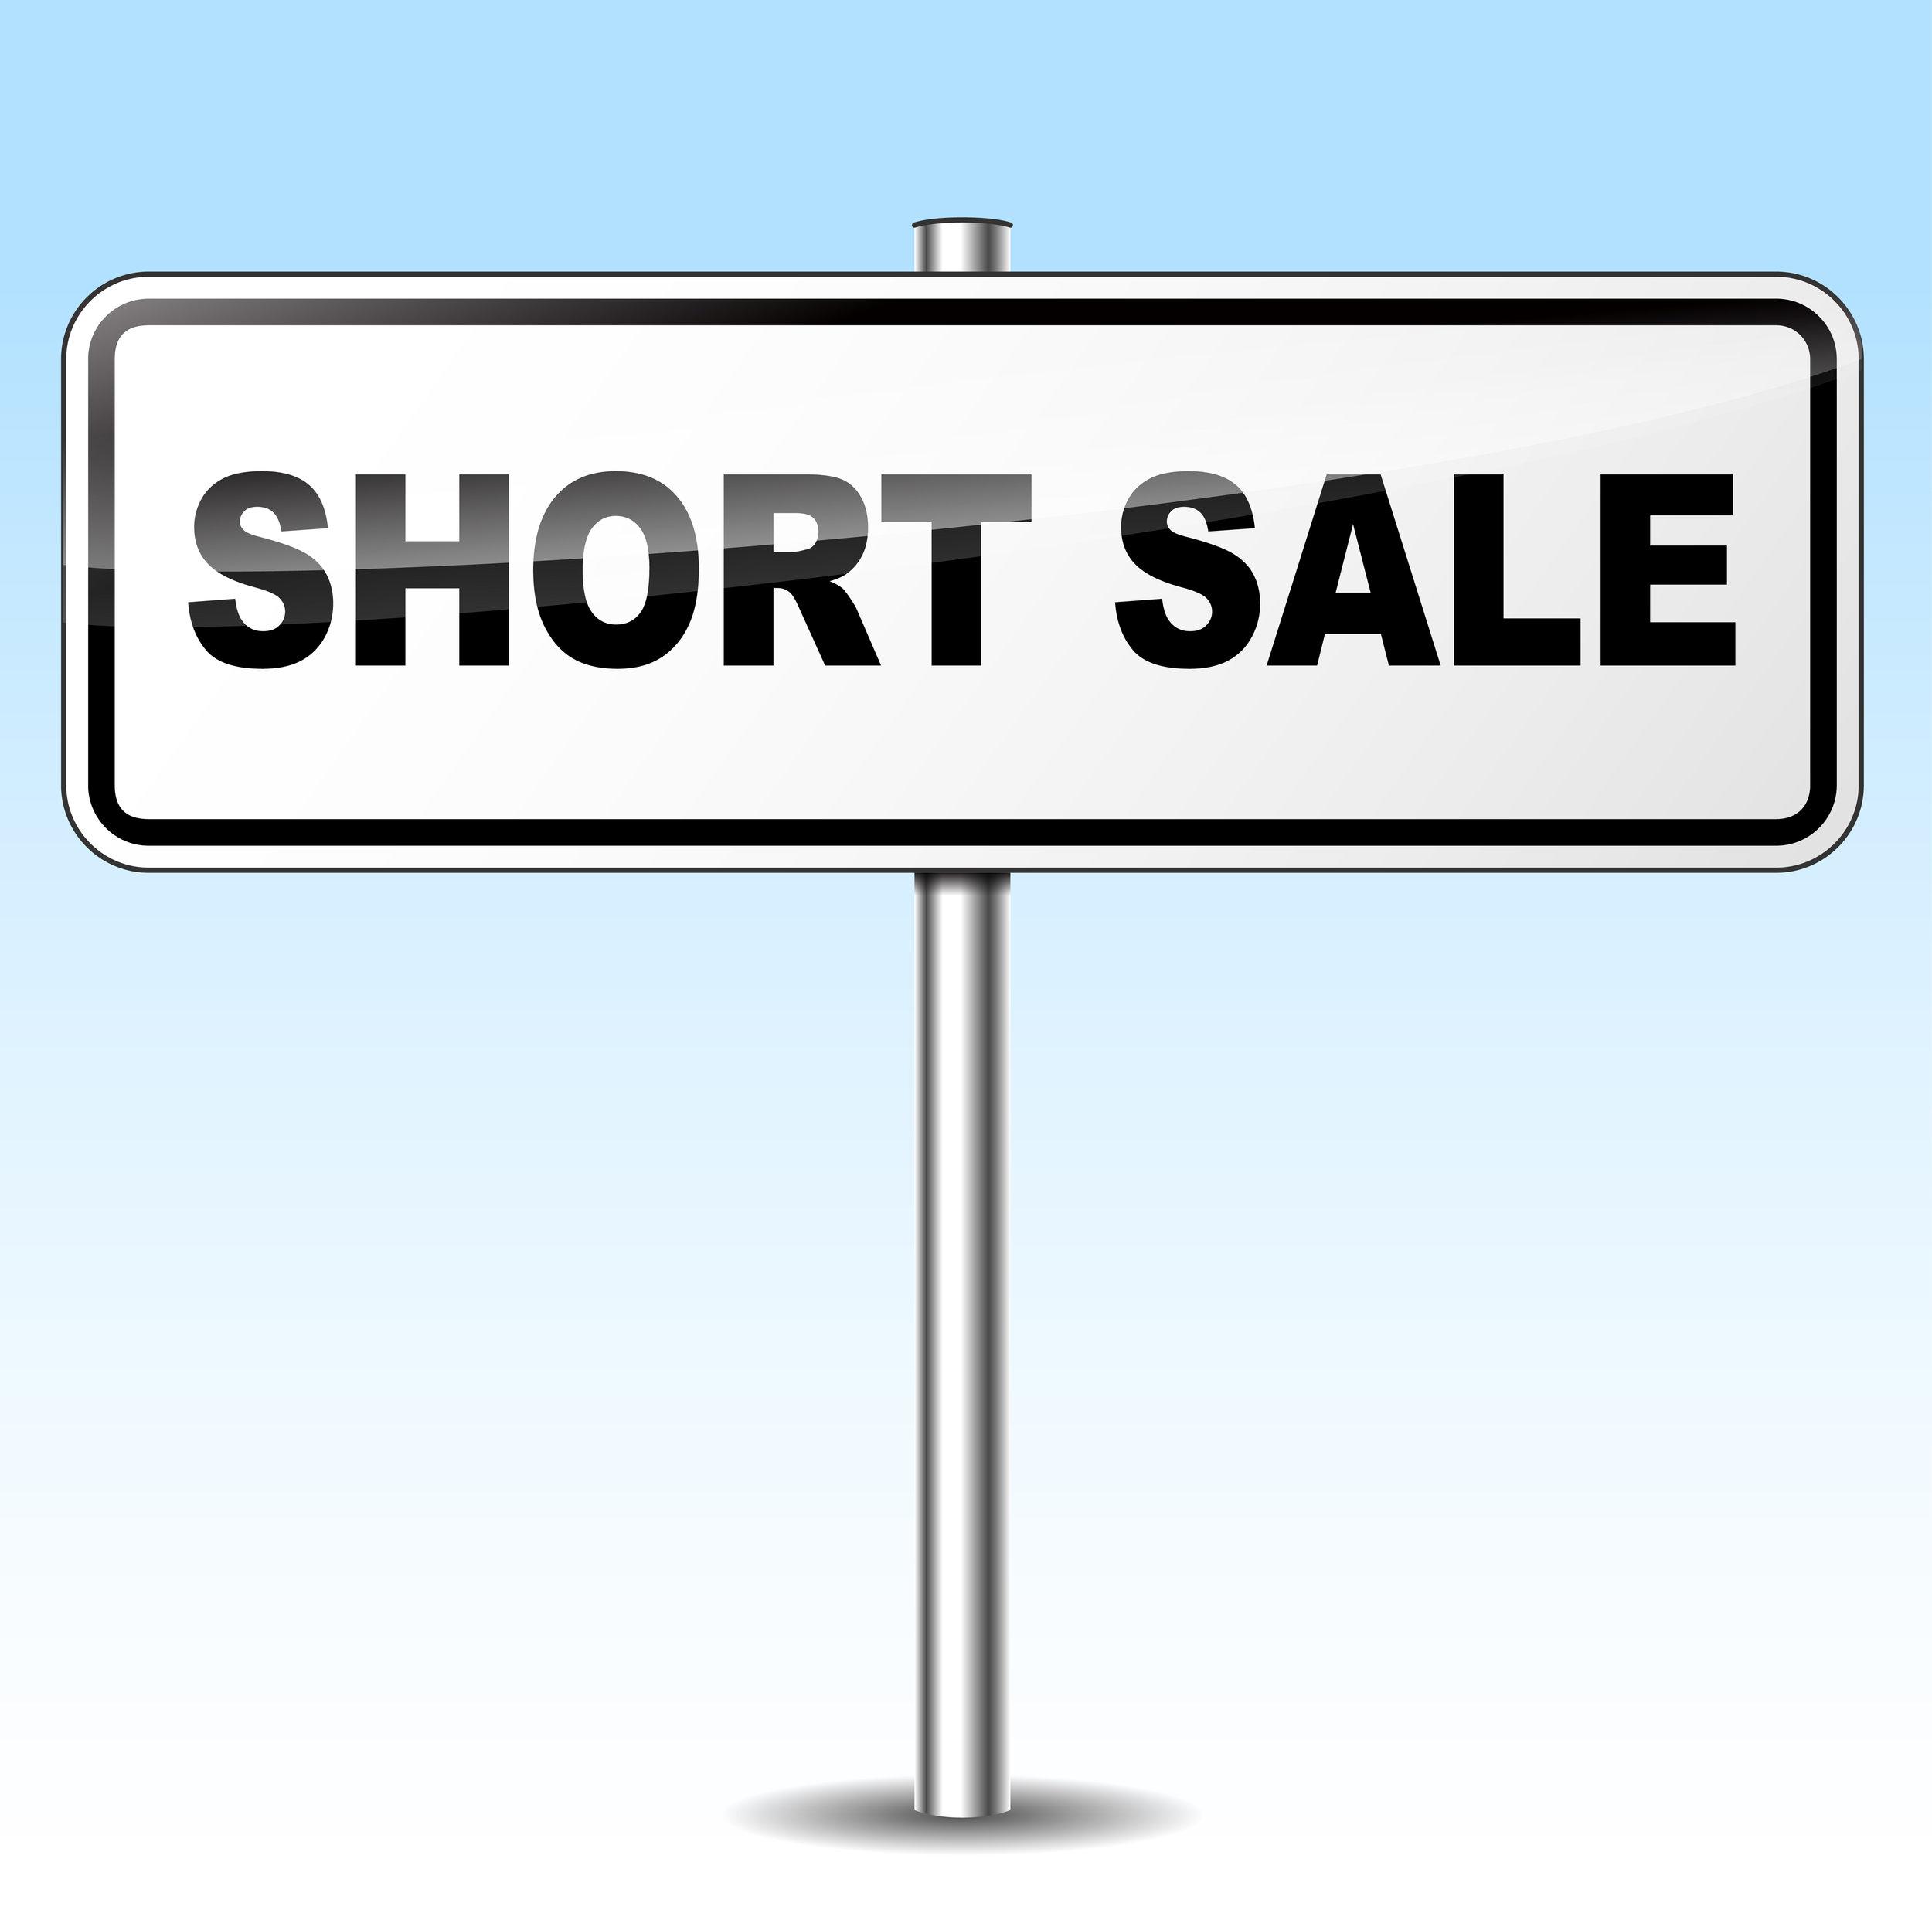 042767925-short-sale-sign.jpeg